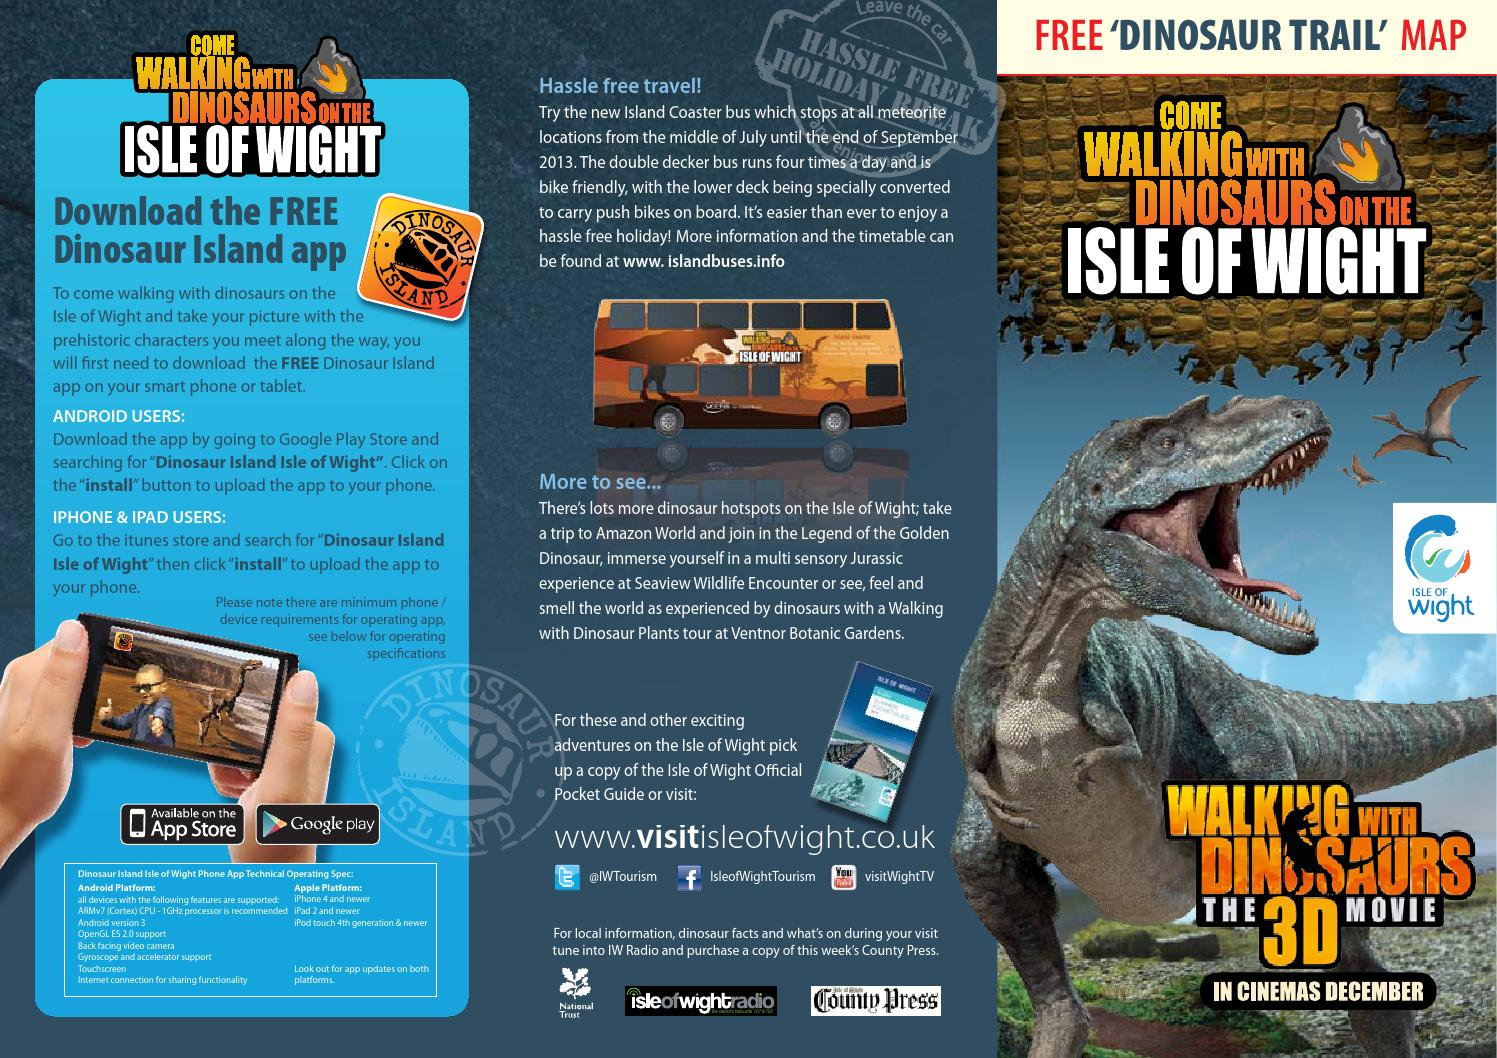 Dinosaur Island Trail Leaflet by Visit Isle of Wight - issuu